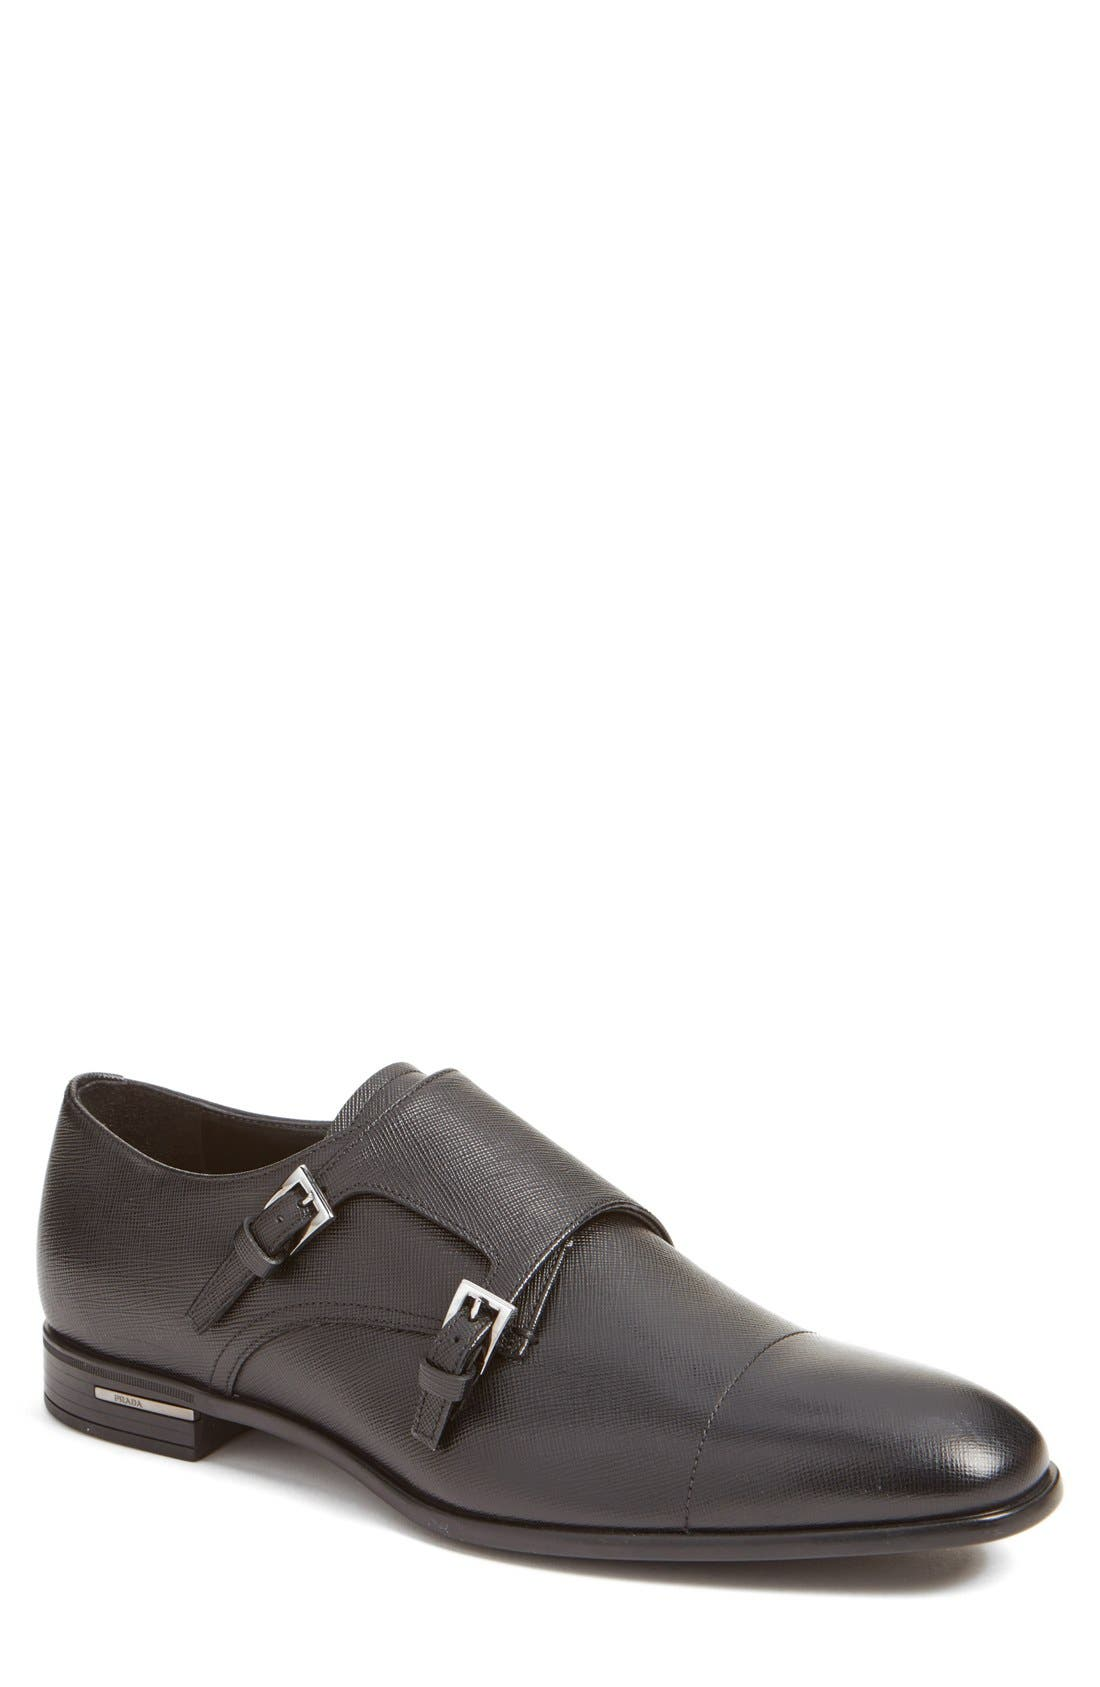 Main Image - Prada Double Monk Strap Shoe (Men)